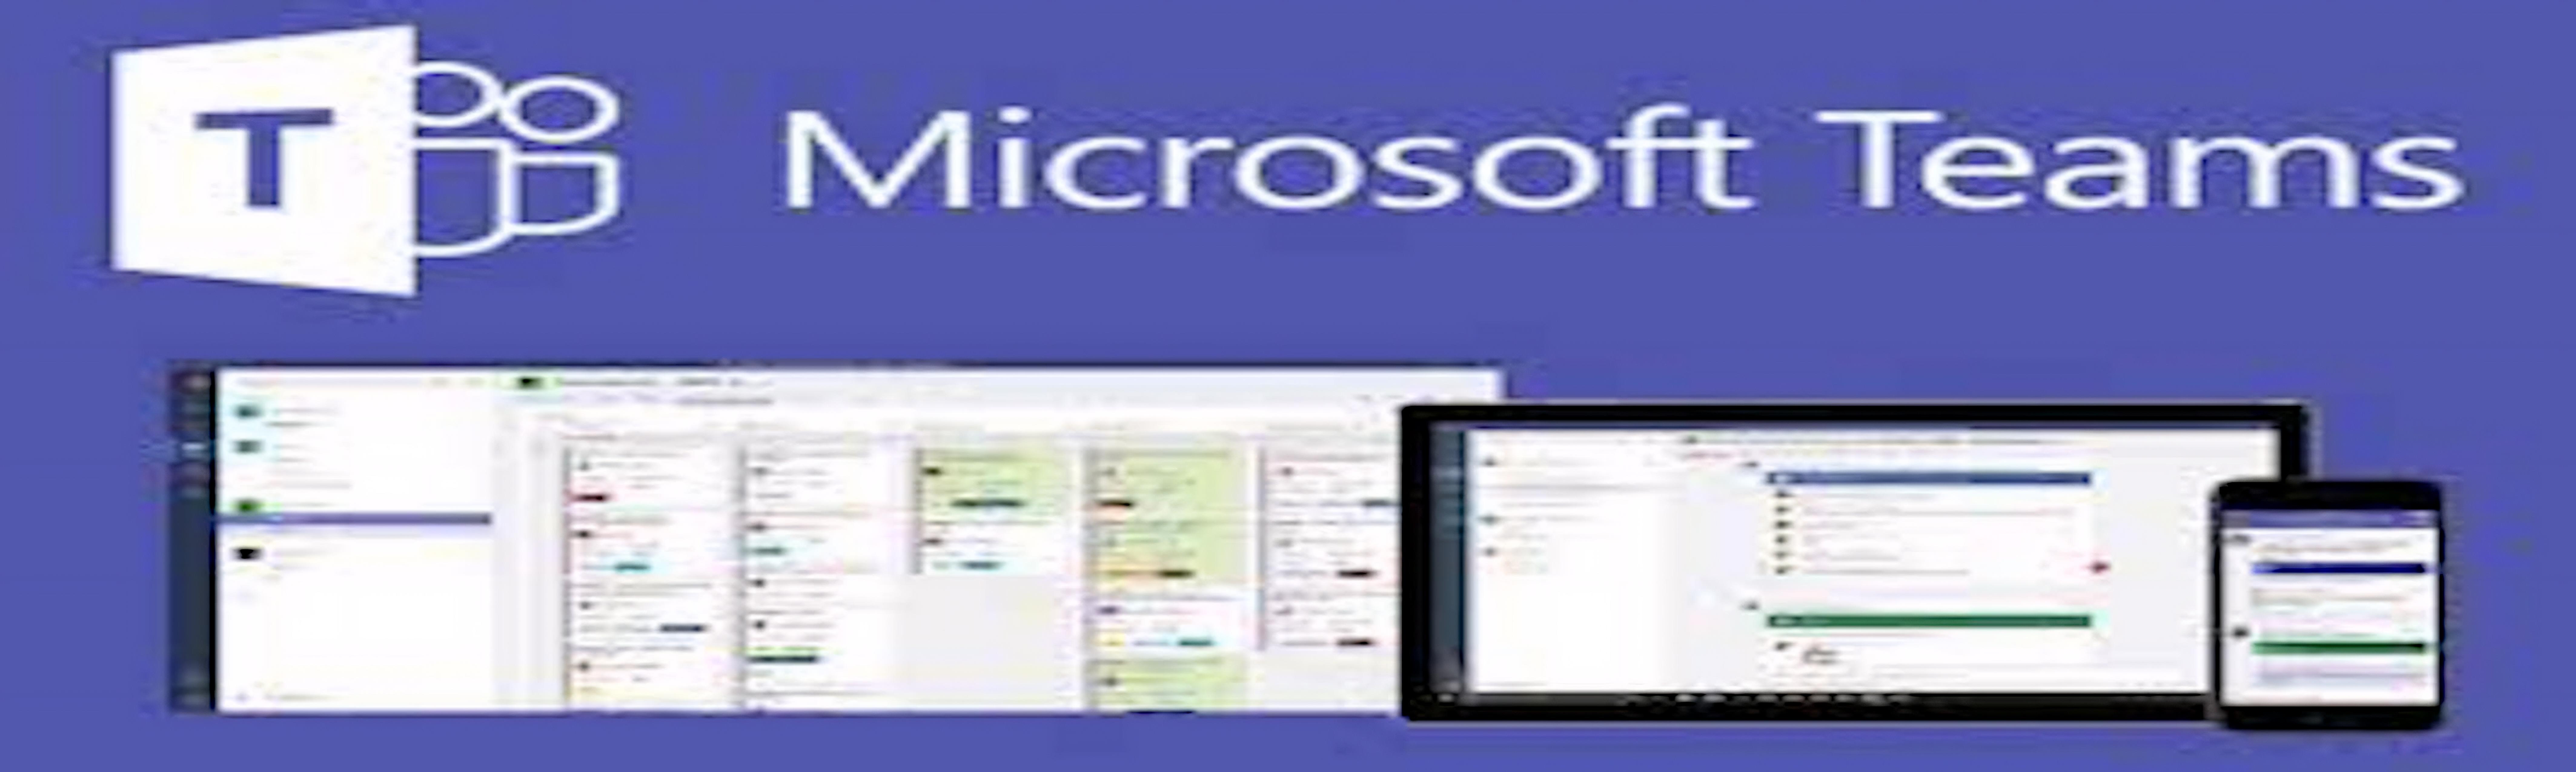 Avis Microsoft Teams : Plateforme collaborative sécurisée - appvizer